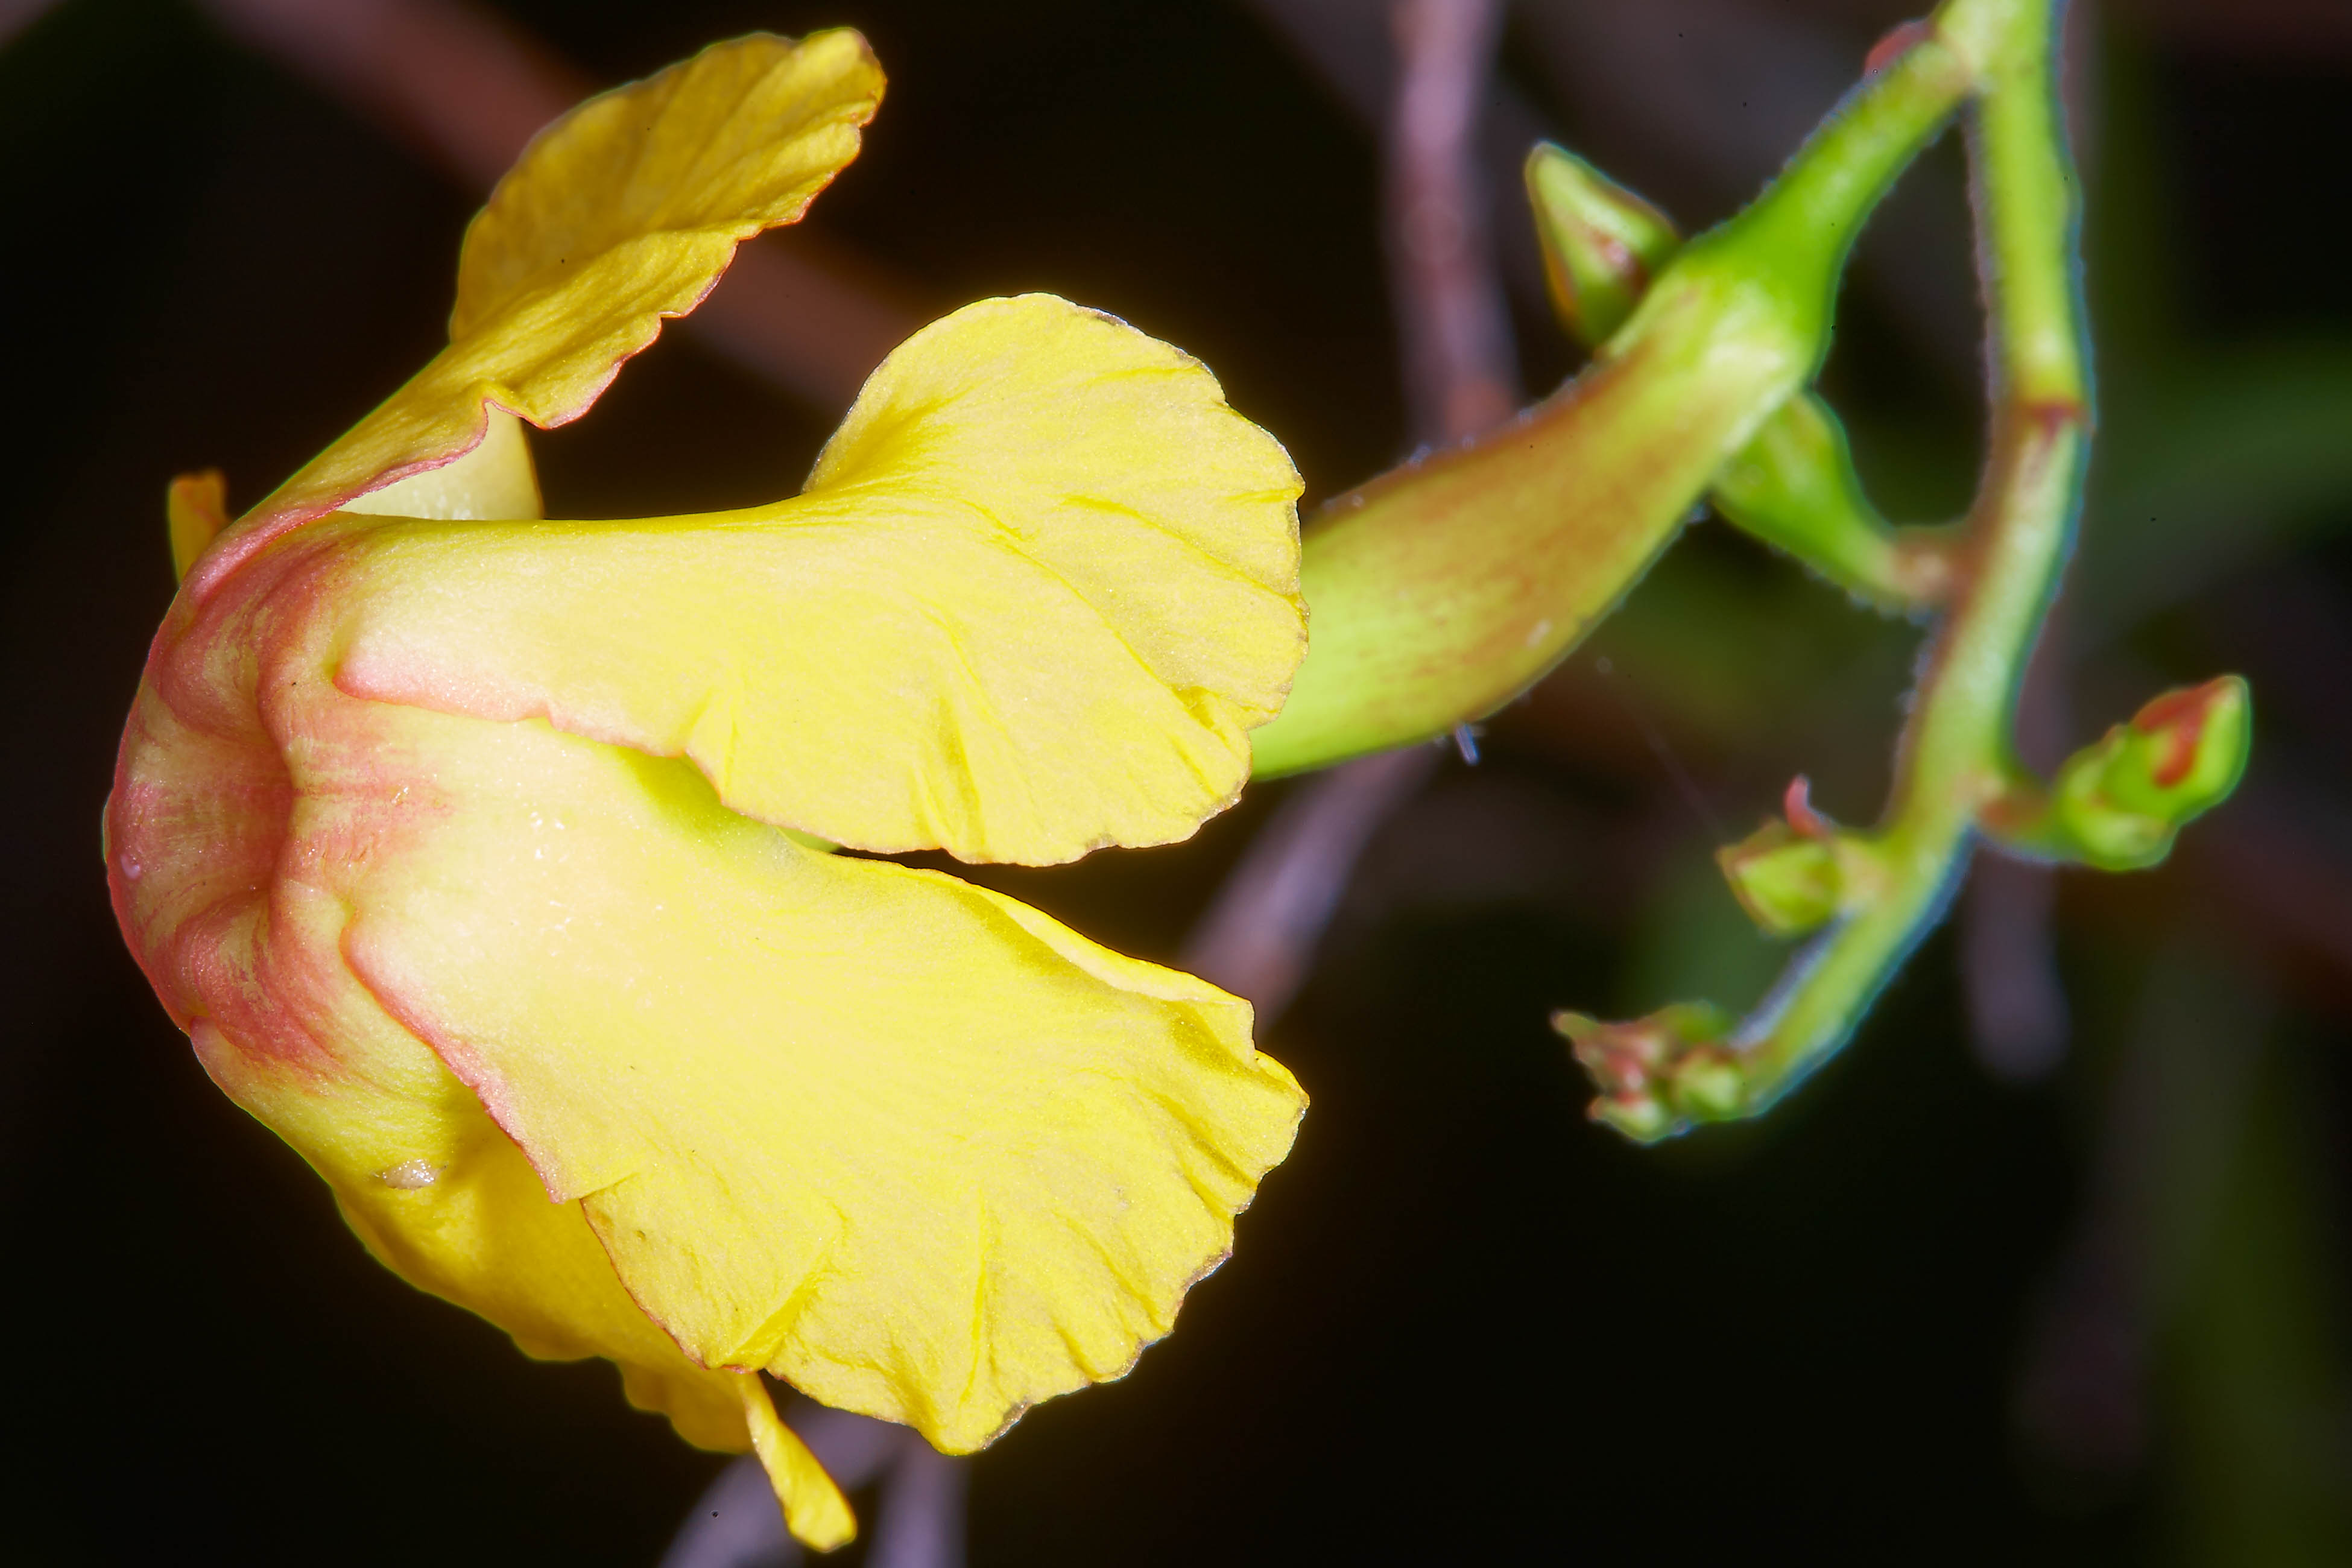 Specimen: Tabernaemontana donnell-smithii